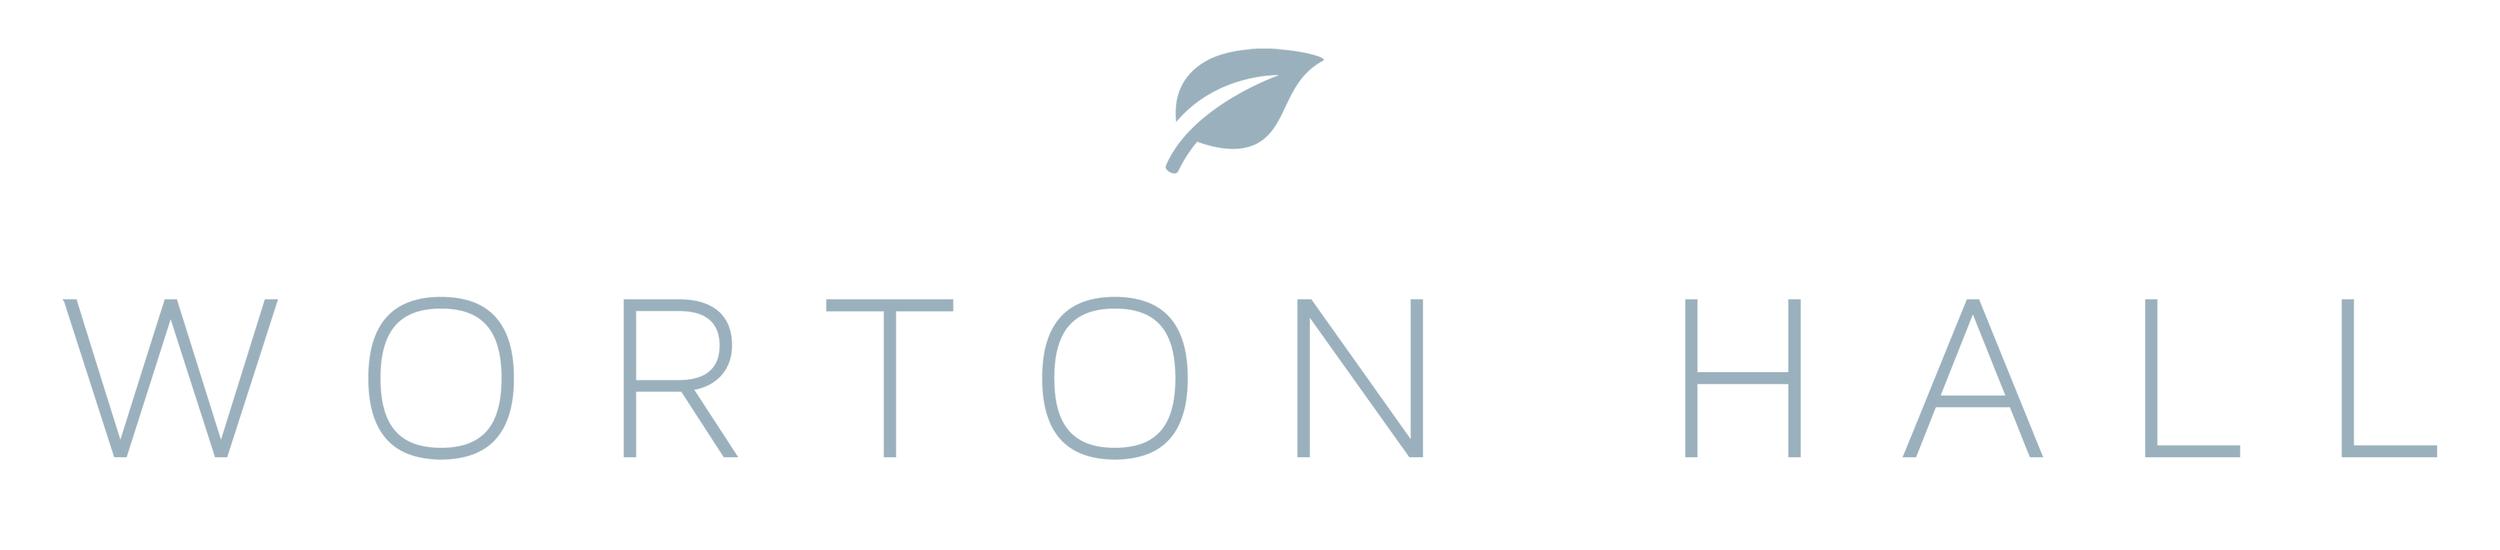 Worton-Hall-Logo_3500px.png